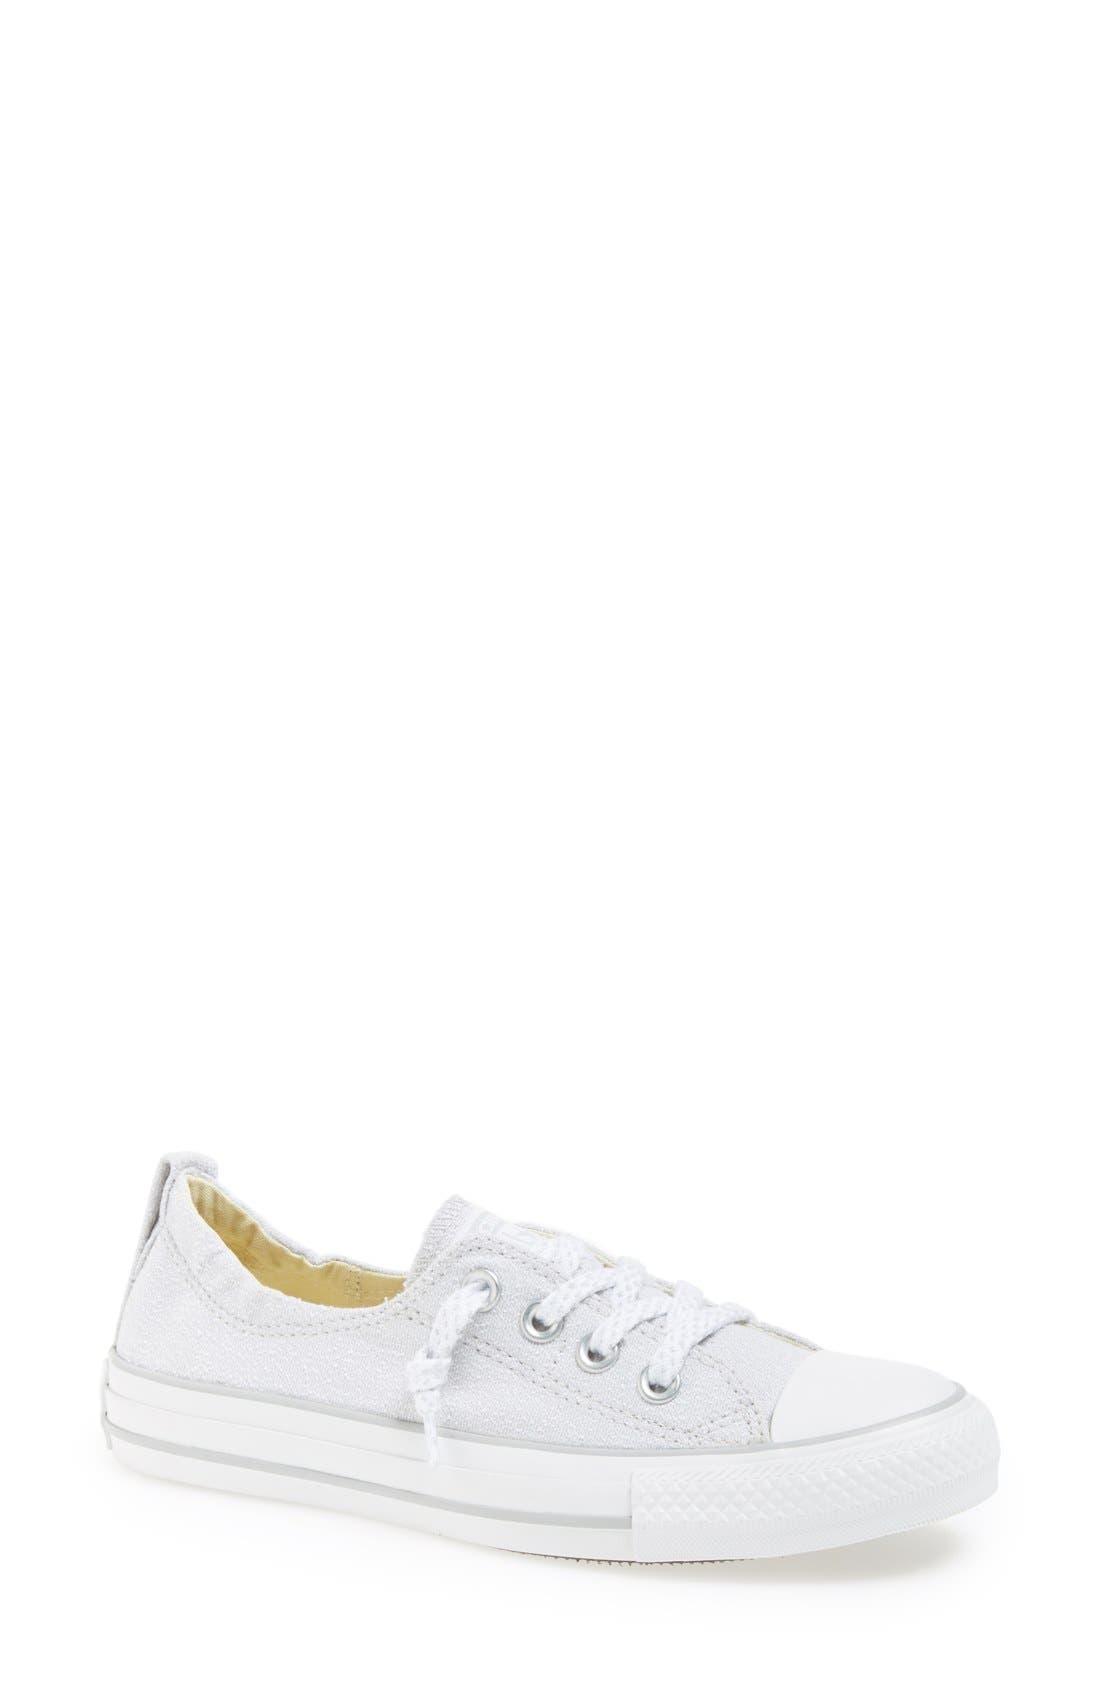 Image of Converse Shoreline Linen Sneaker